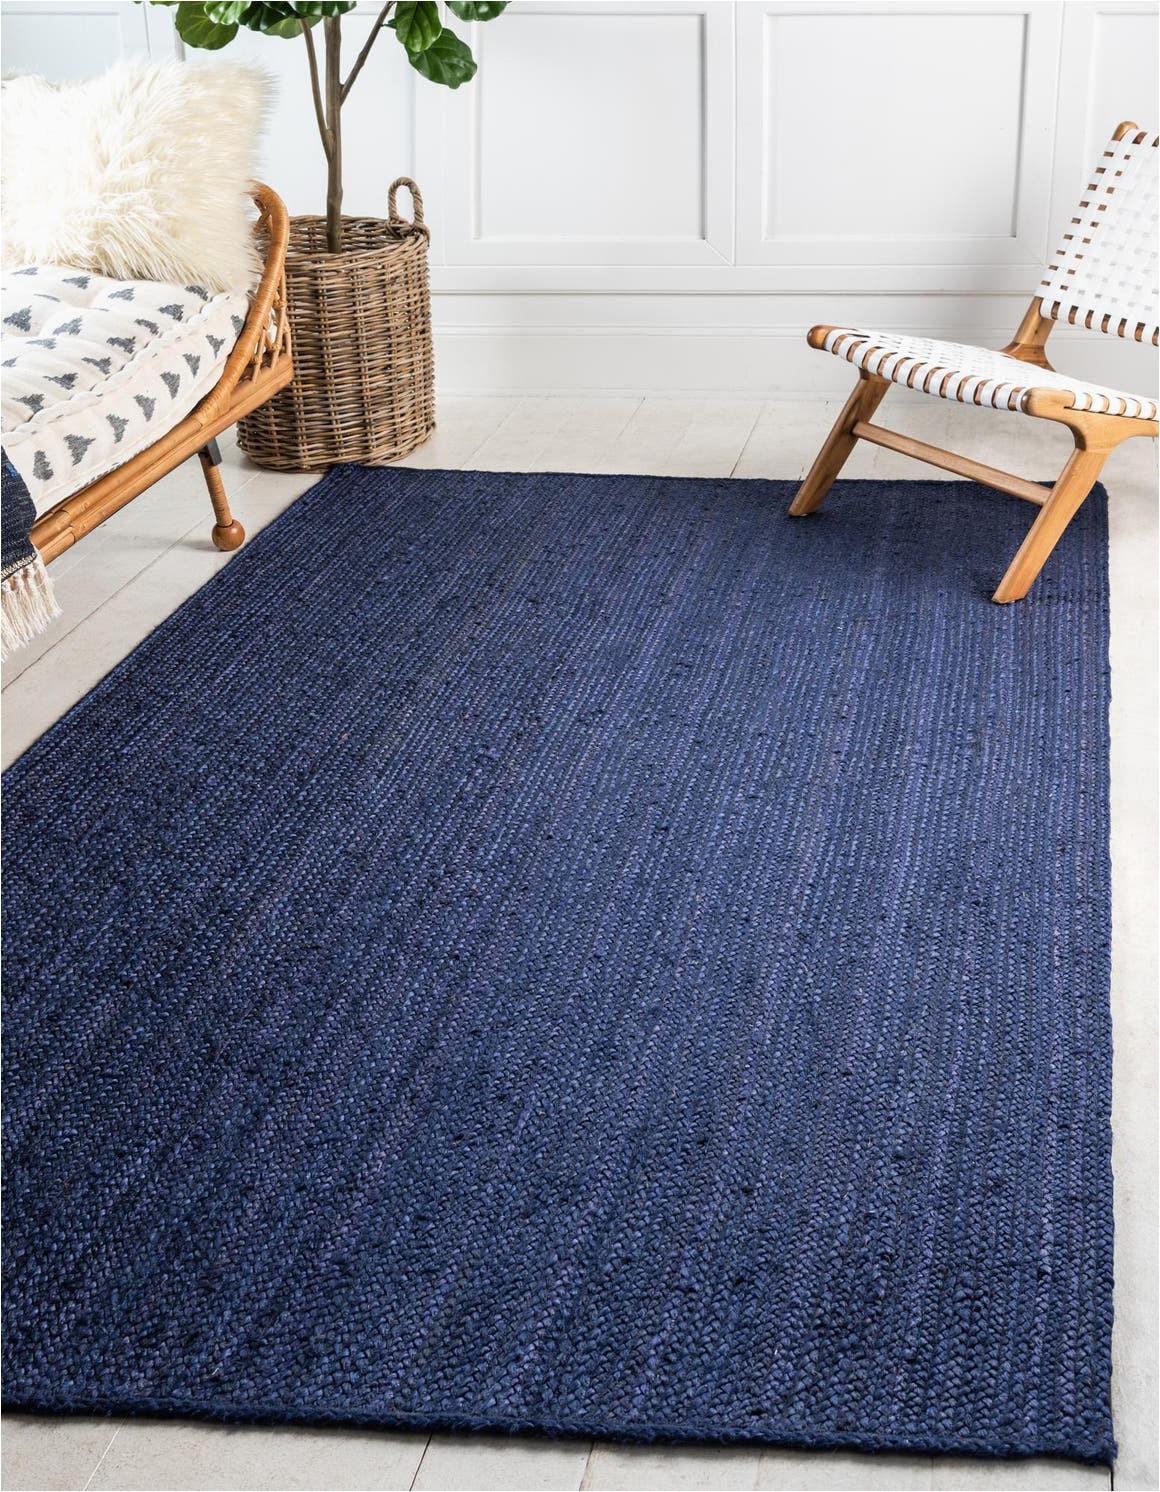 navy blue 8x10 braided jute area rug